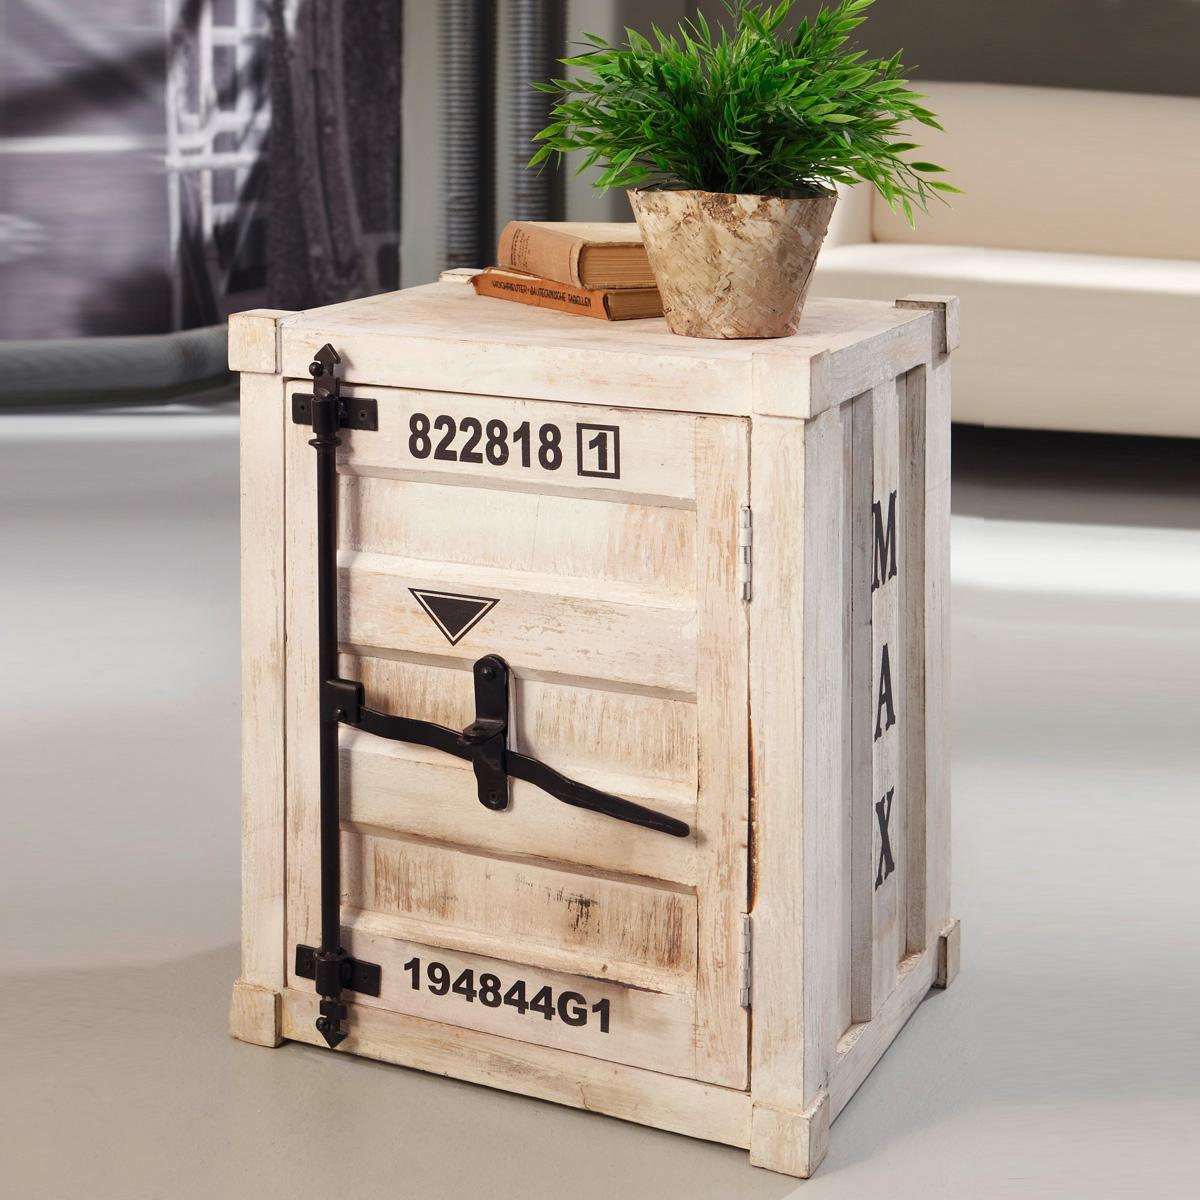 impressionen kommode antik wei inspirierendes design f r wohnm bel. Black Bedroom Furniture Sets. Home Design Ideas